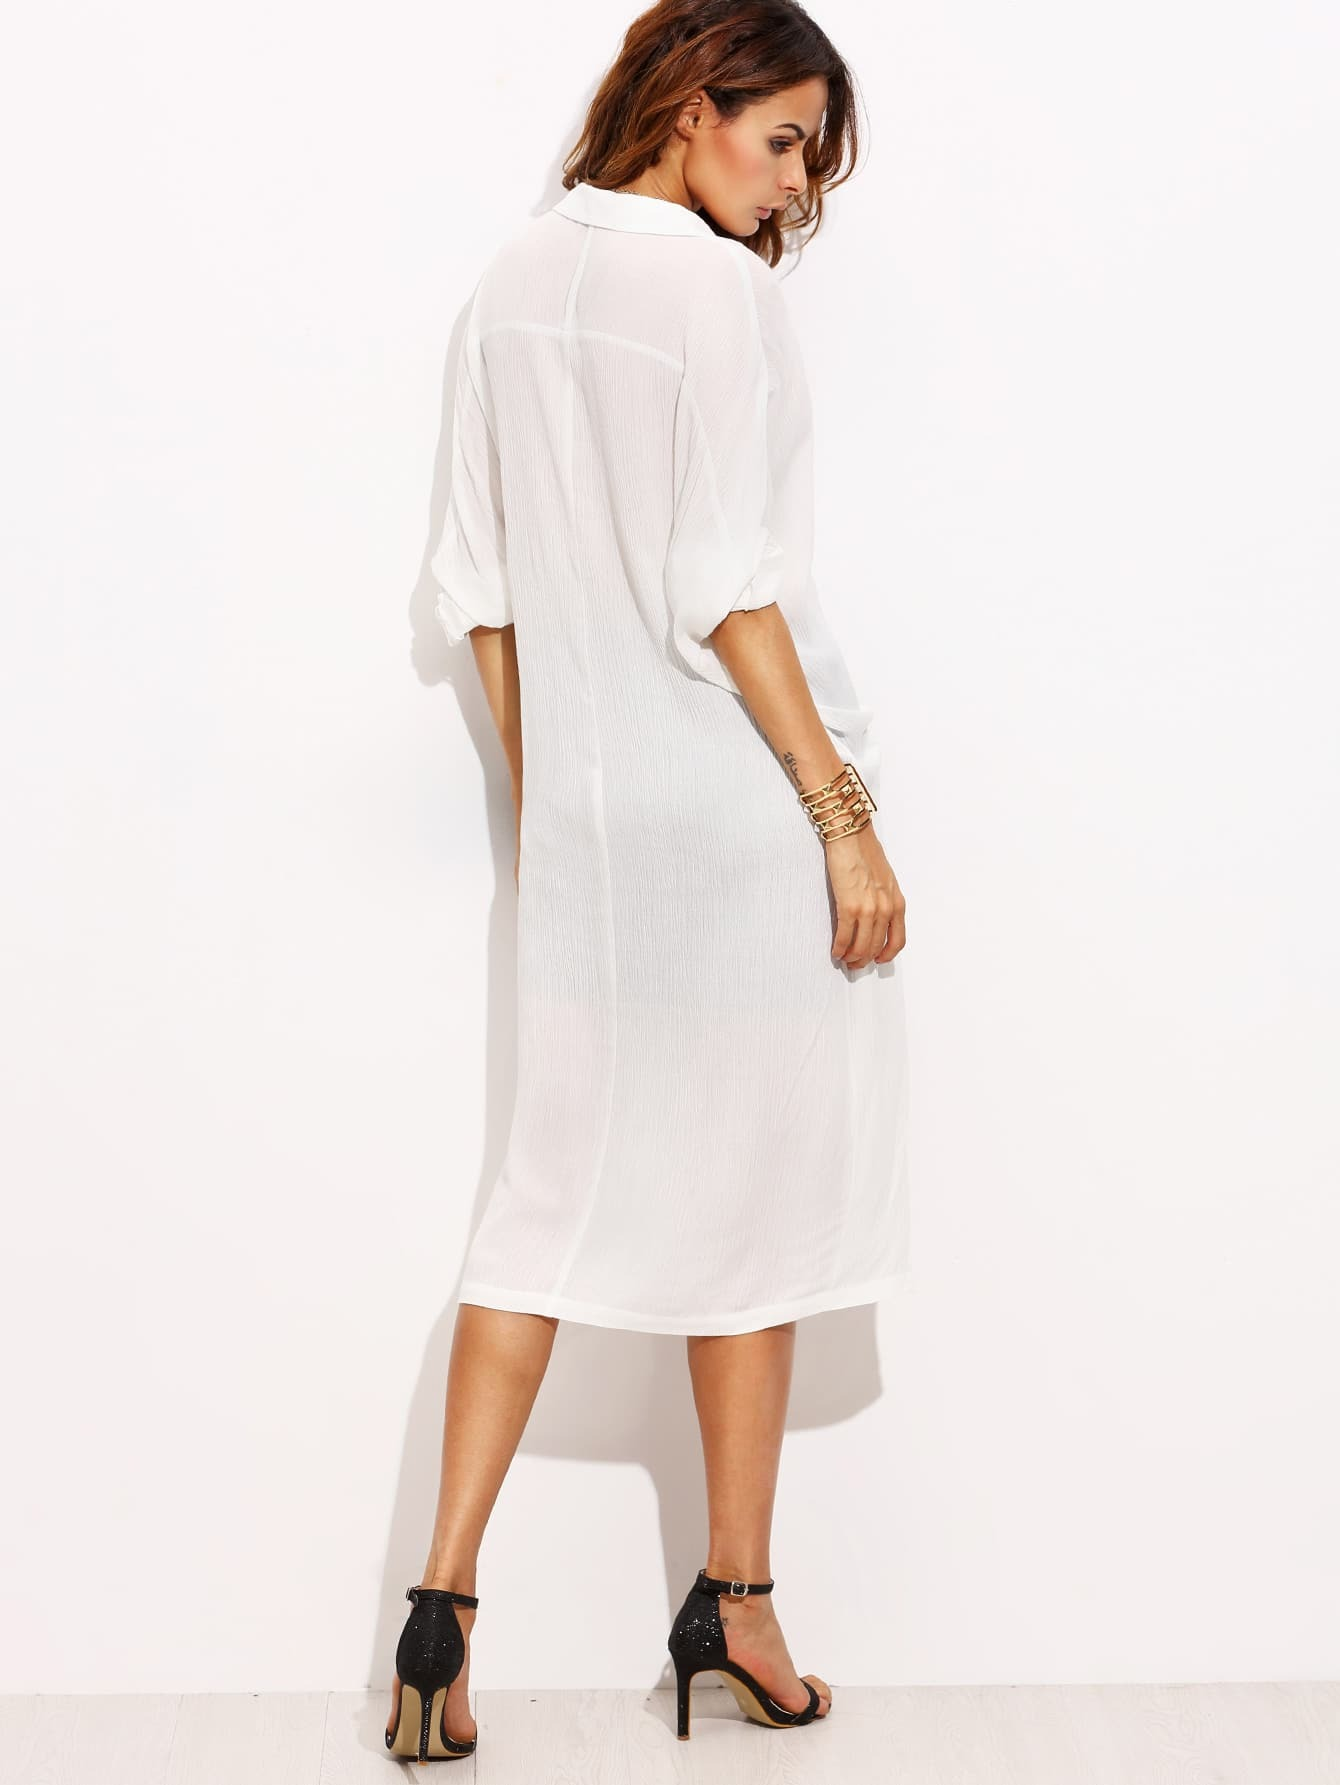 blouse160804715_3